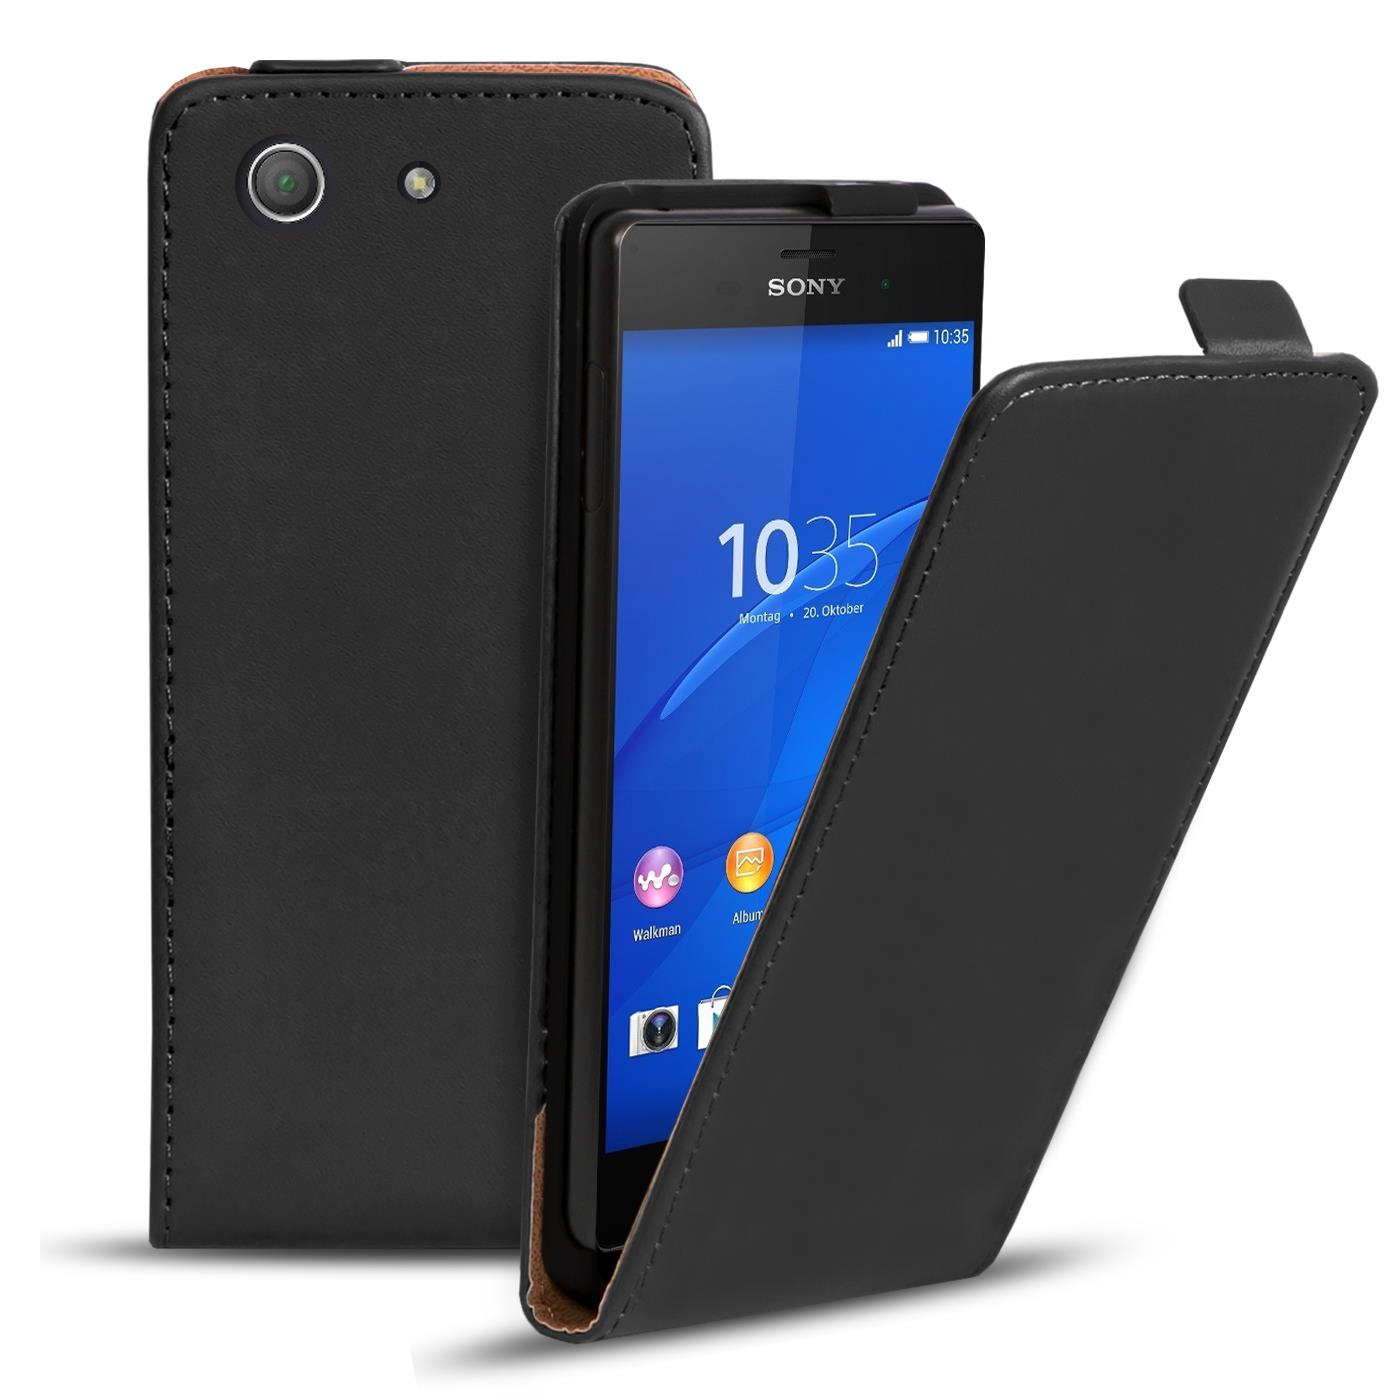 Basic Flip Sony Xperia Z3 pact von Safers